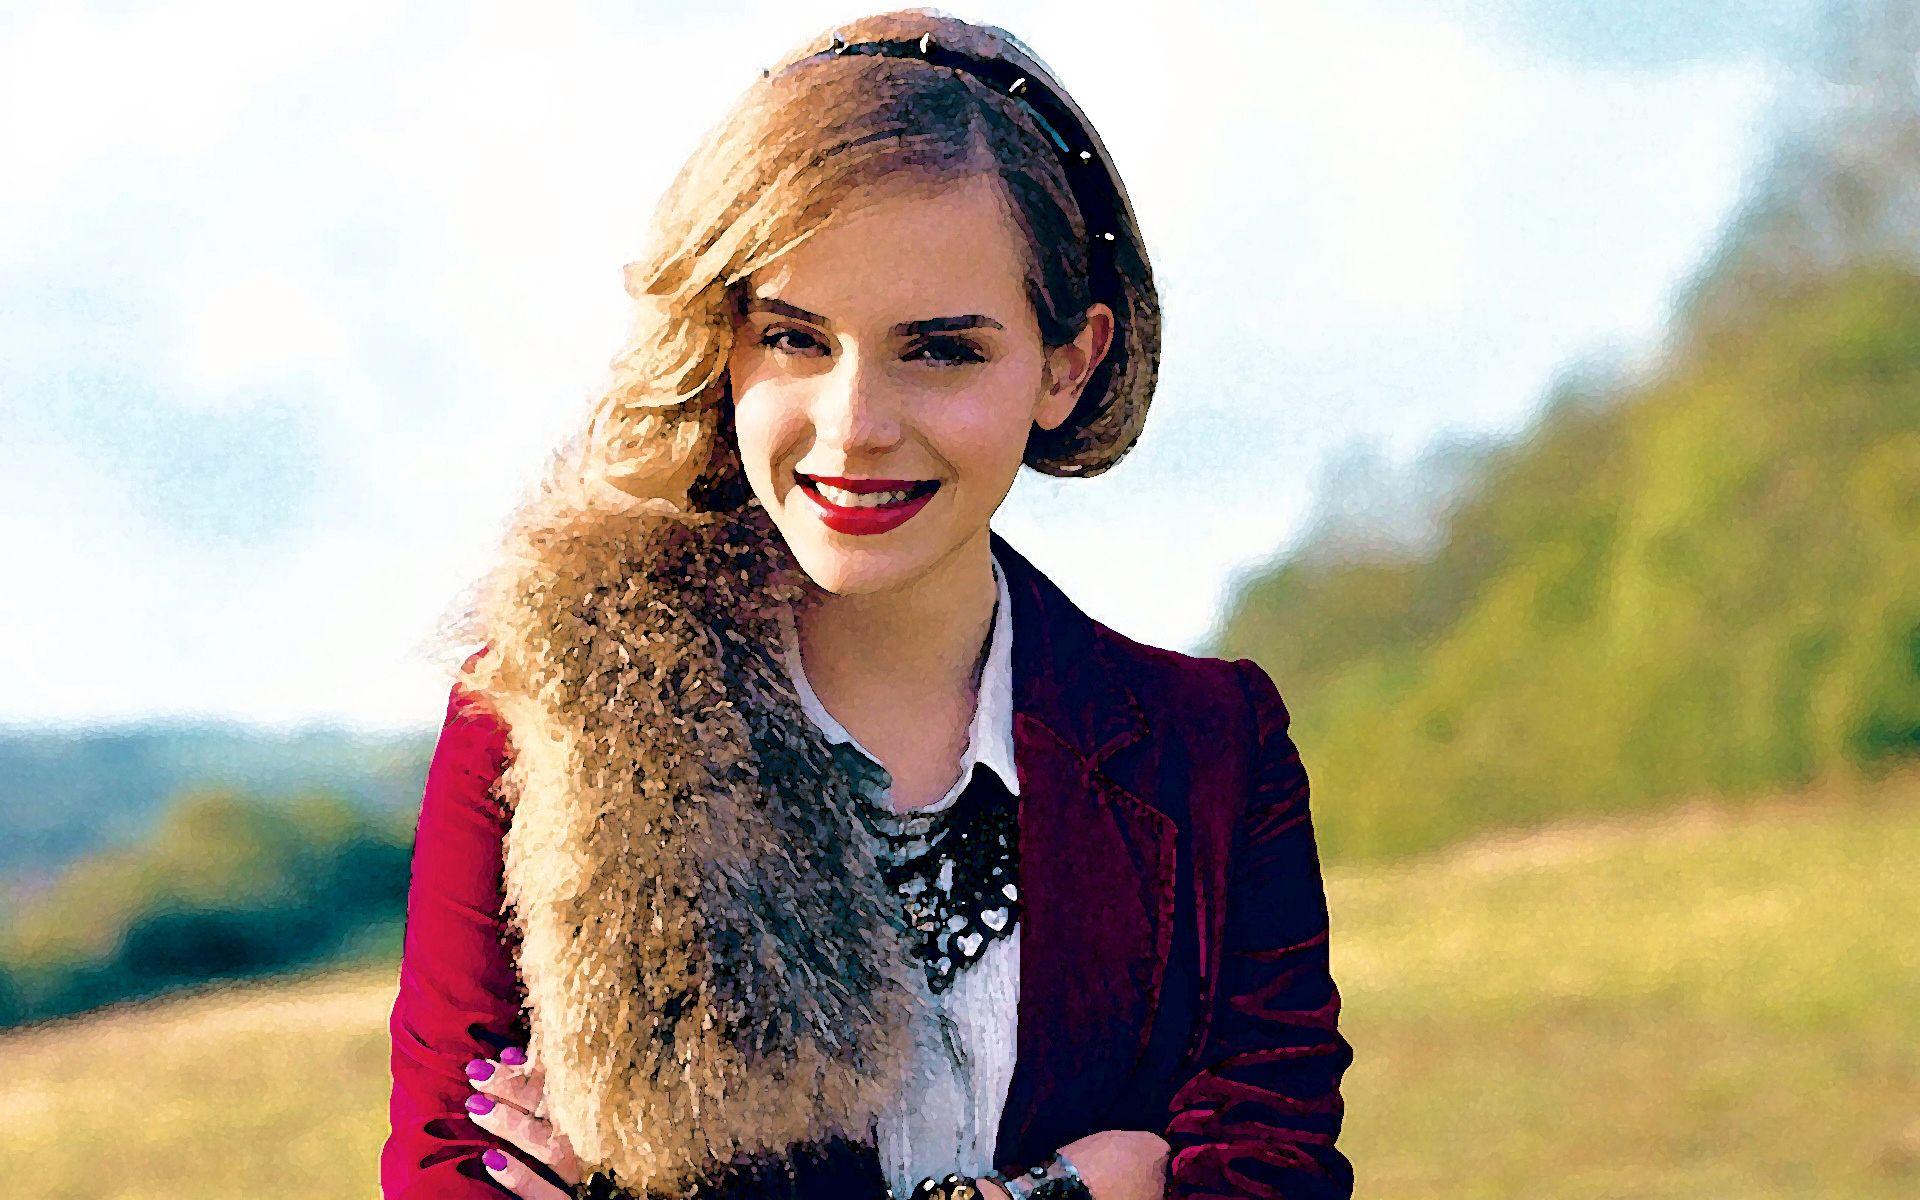 Hd wallpaper emma watson - Emma Watson Wallpapers High Resolution And Quality Download Hd Wallpapers Pinterest Emma Watson Wallpaper Wallpaper And Wallpaper Backgrounds